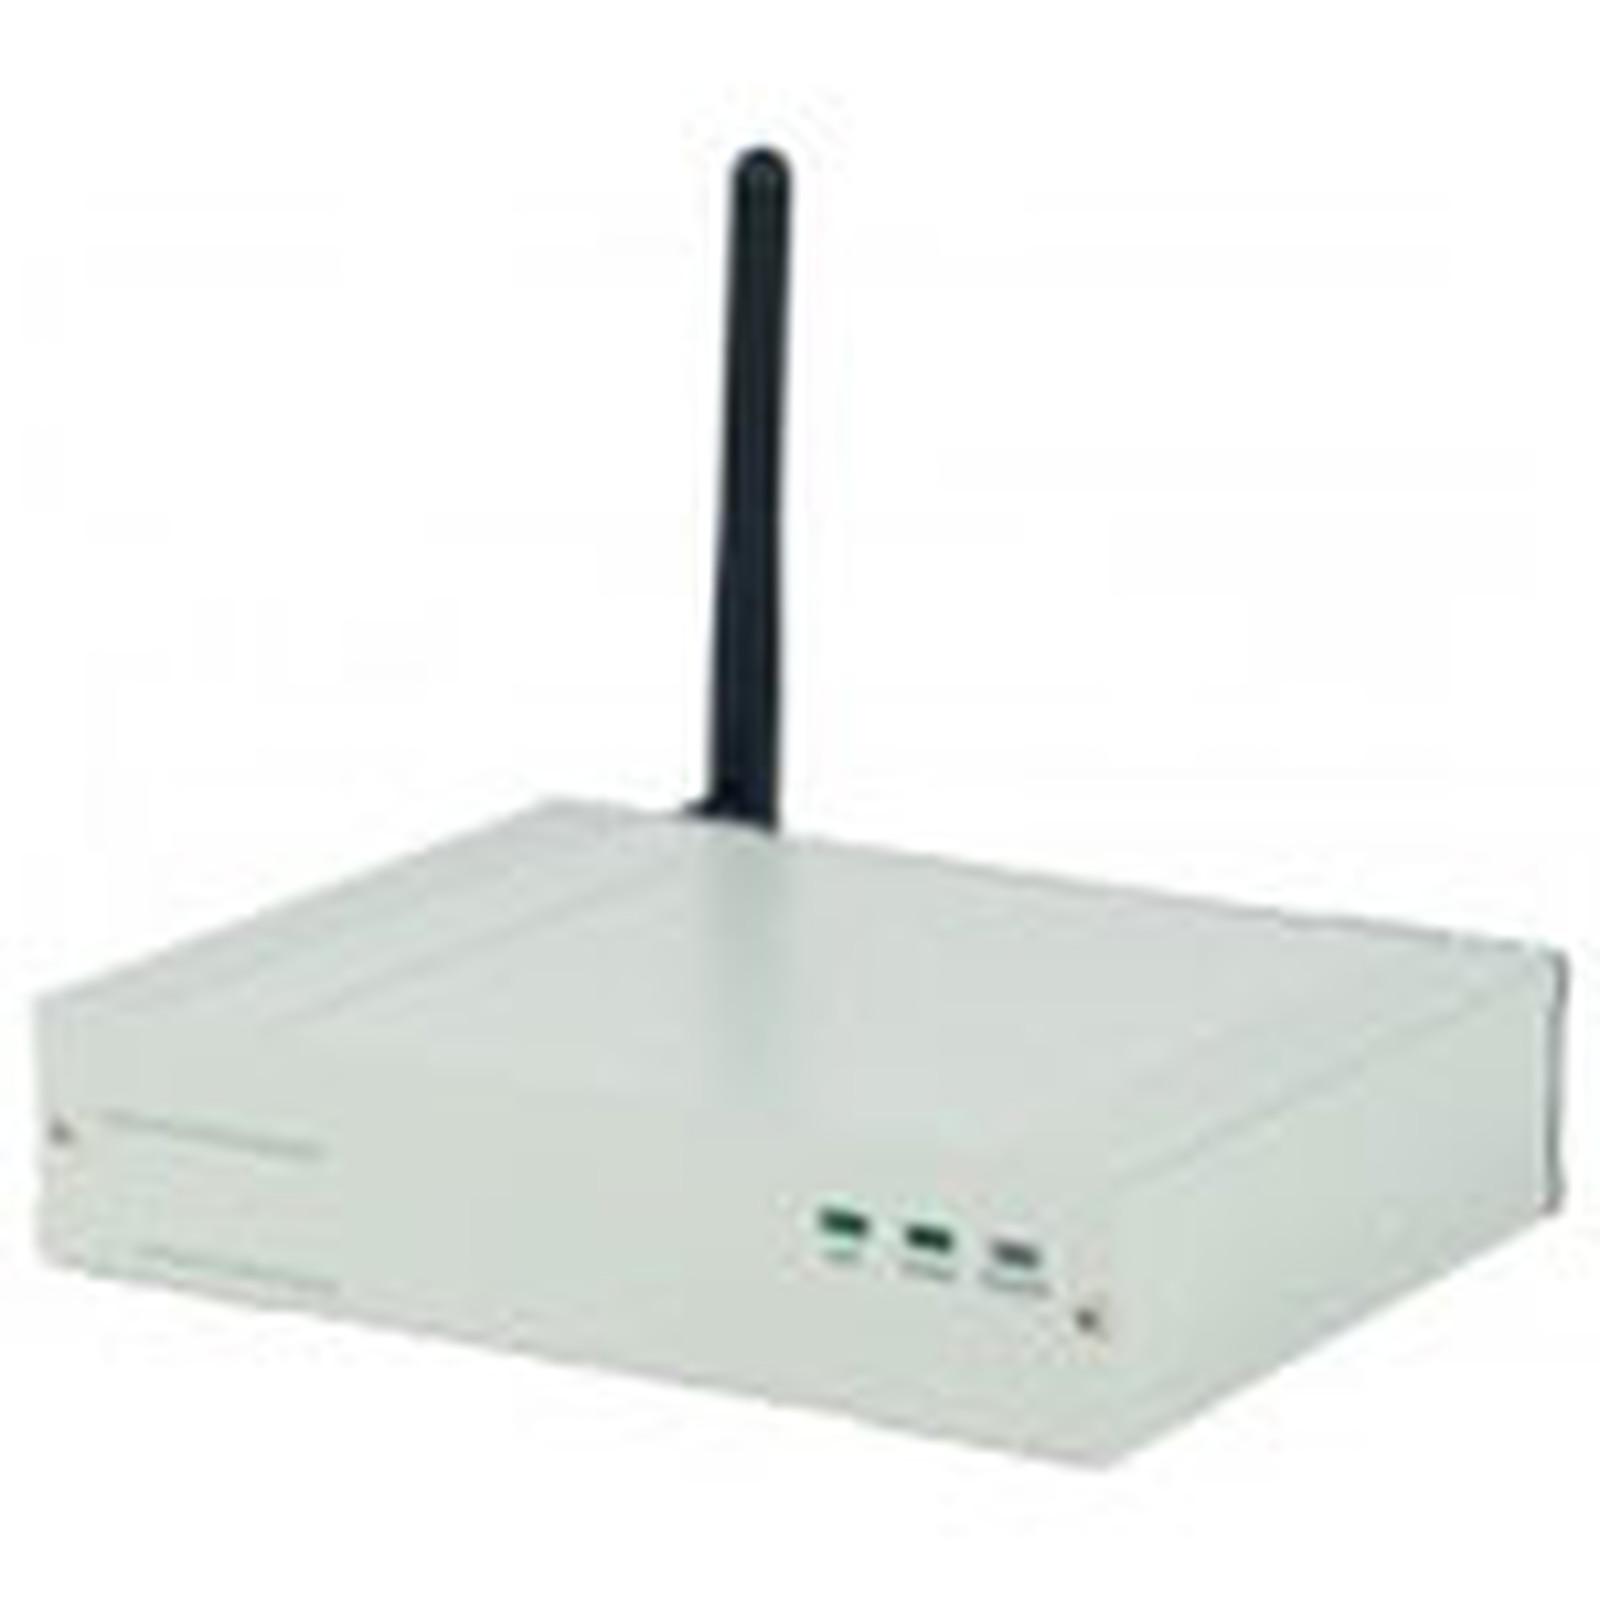 Emetteur VGA sur Wi-Fi G